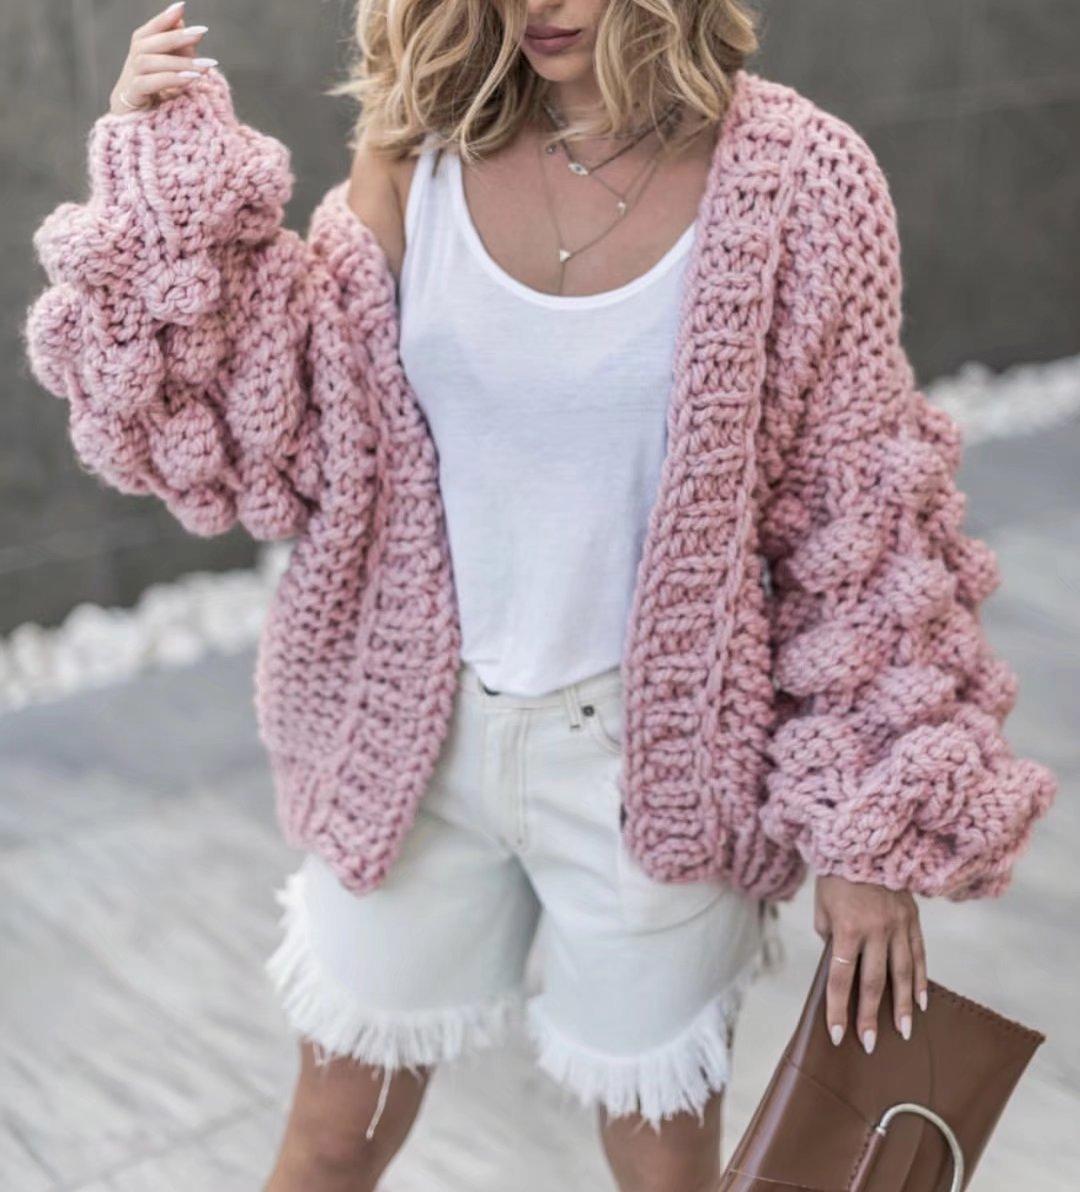 Hand Made Pink Coarse Knitted Sweater Women Streetwear Winter Lantern Sleeve Cardigan Coat Knitted Casual Warm Shawl Sweaters